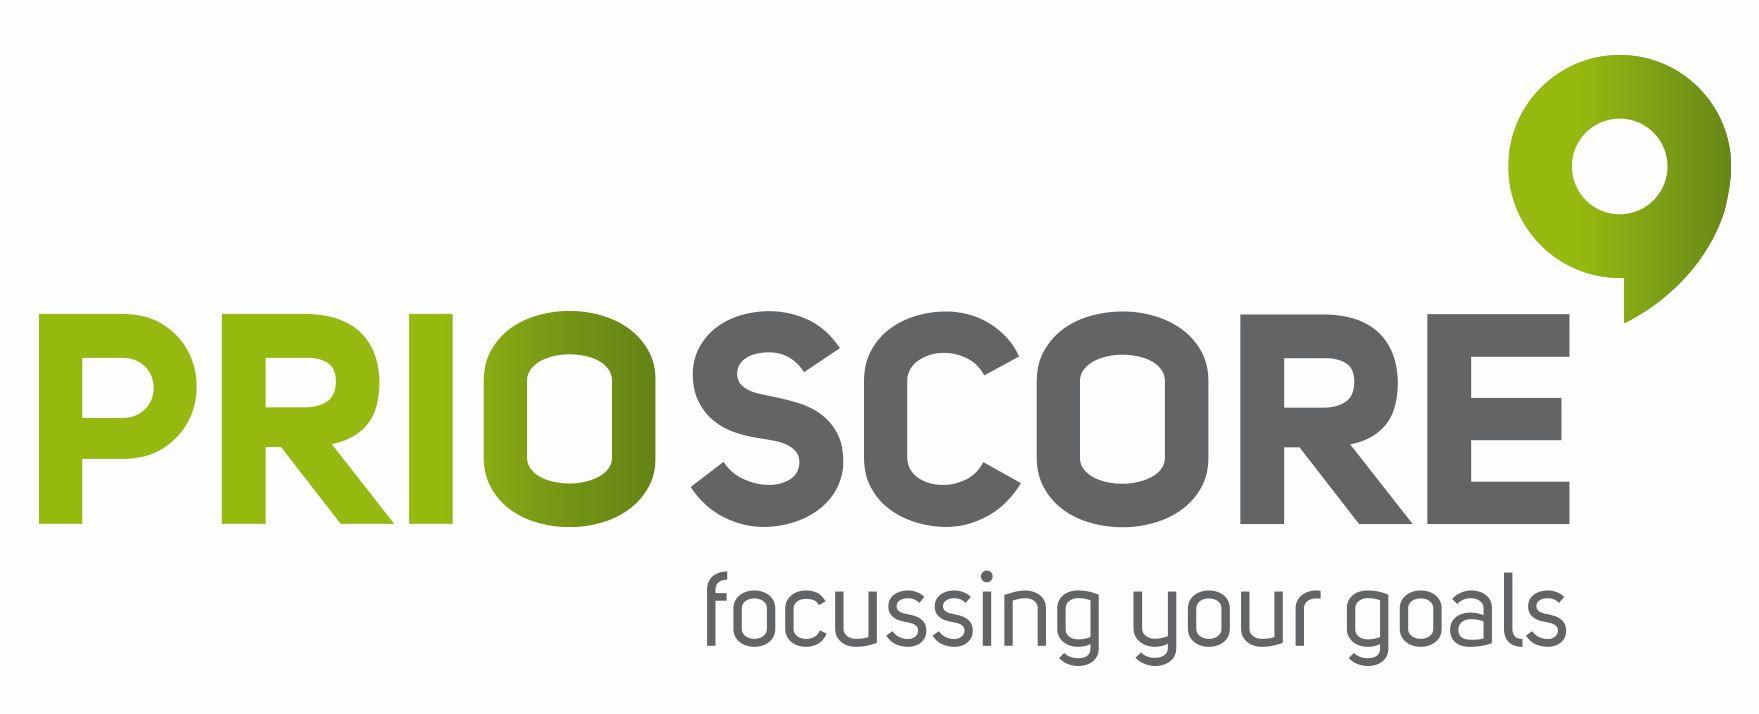 logo_Prioscore 2015-03